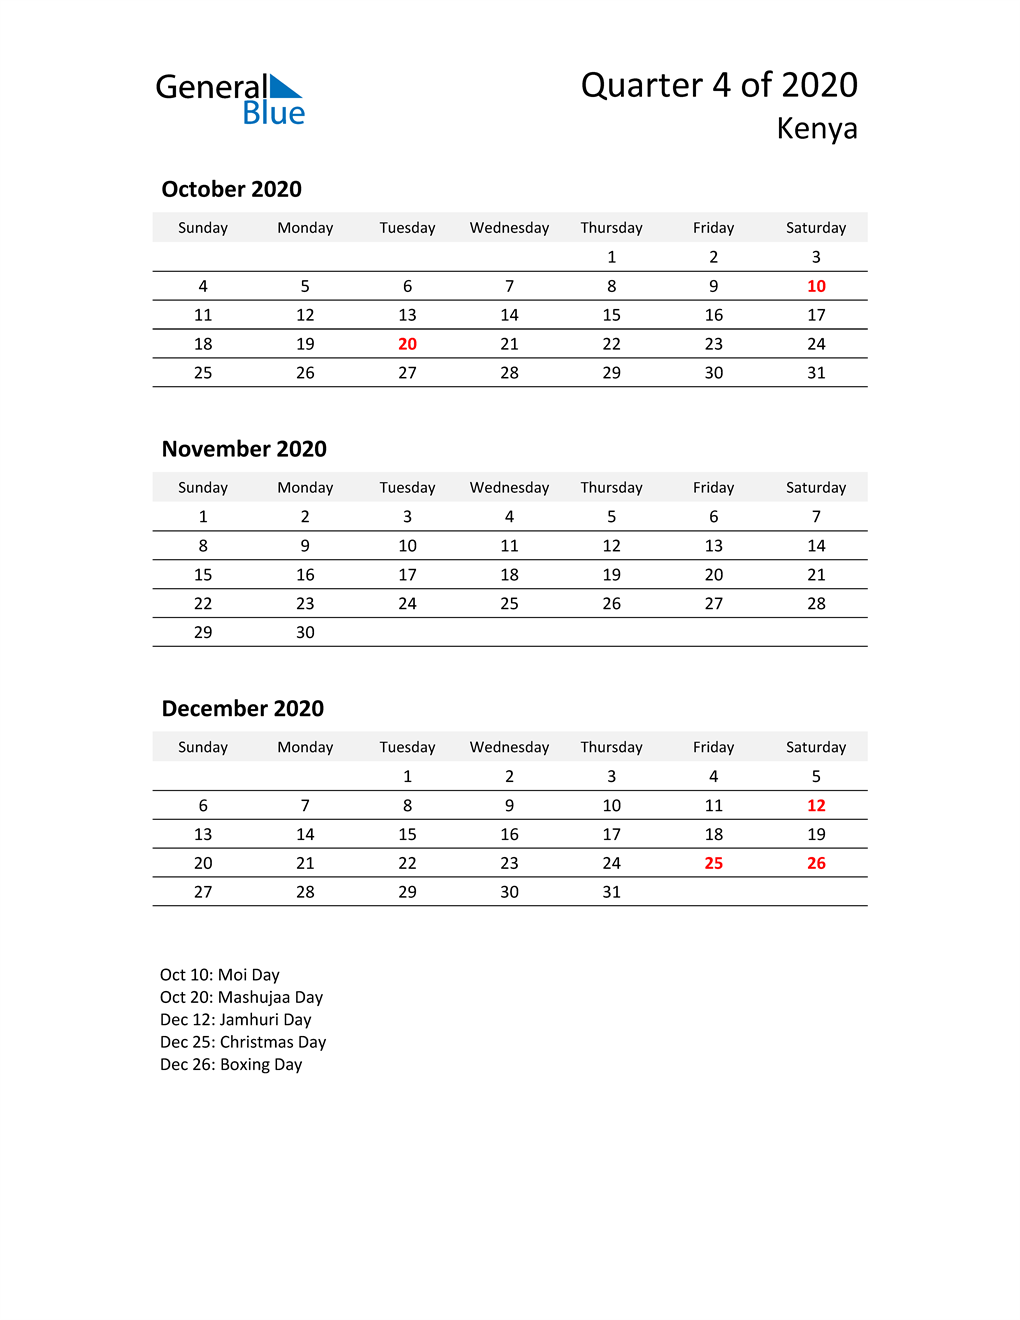 2020 Three-Month Calendar for Kenya